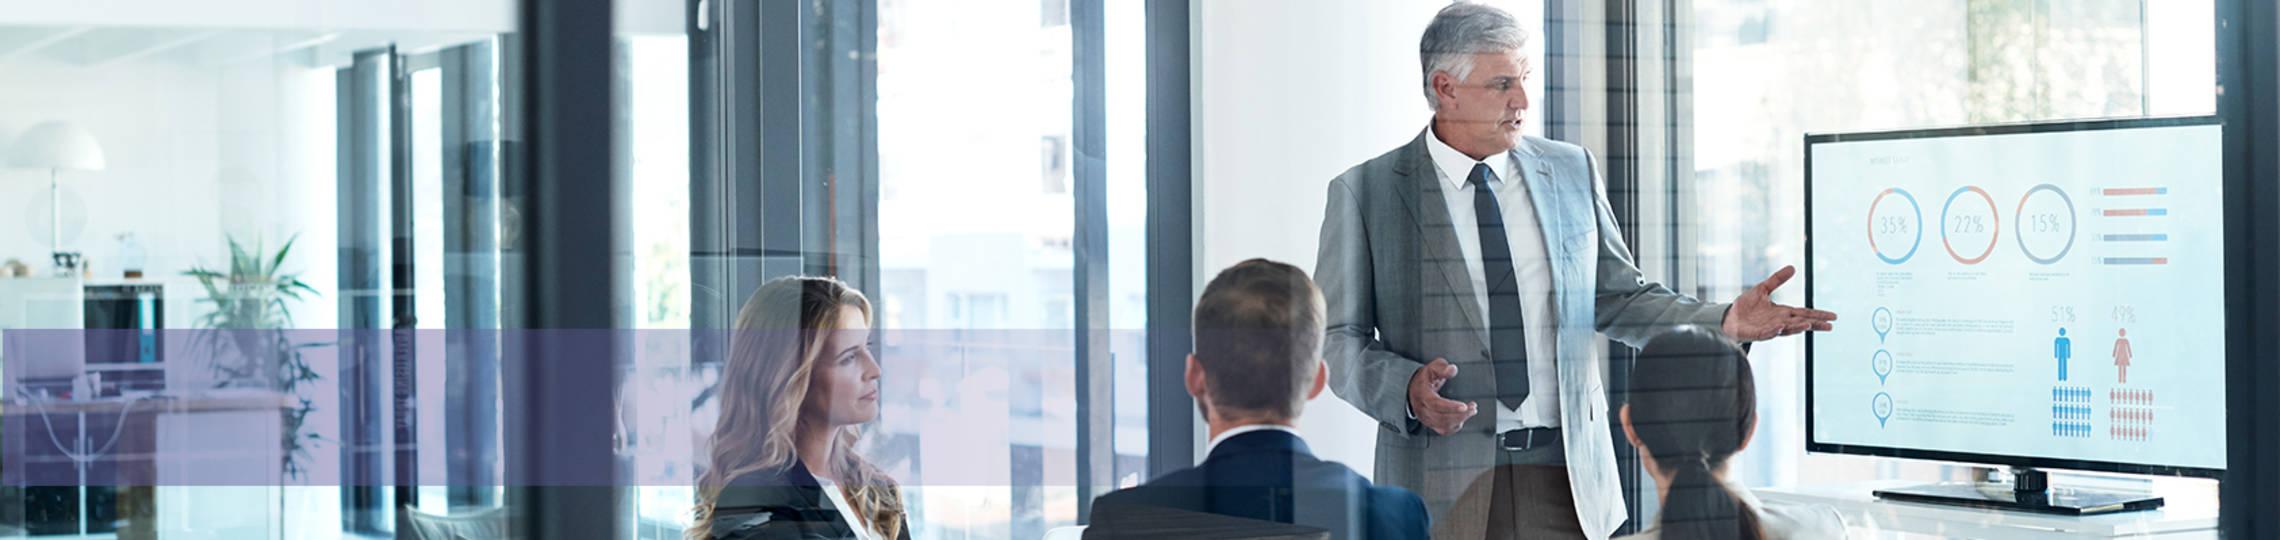 Training Microsoft SPLA en CSP voor Managed Service Providers